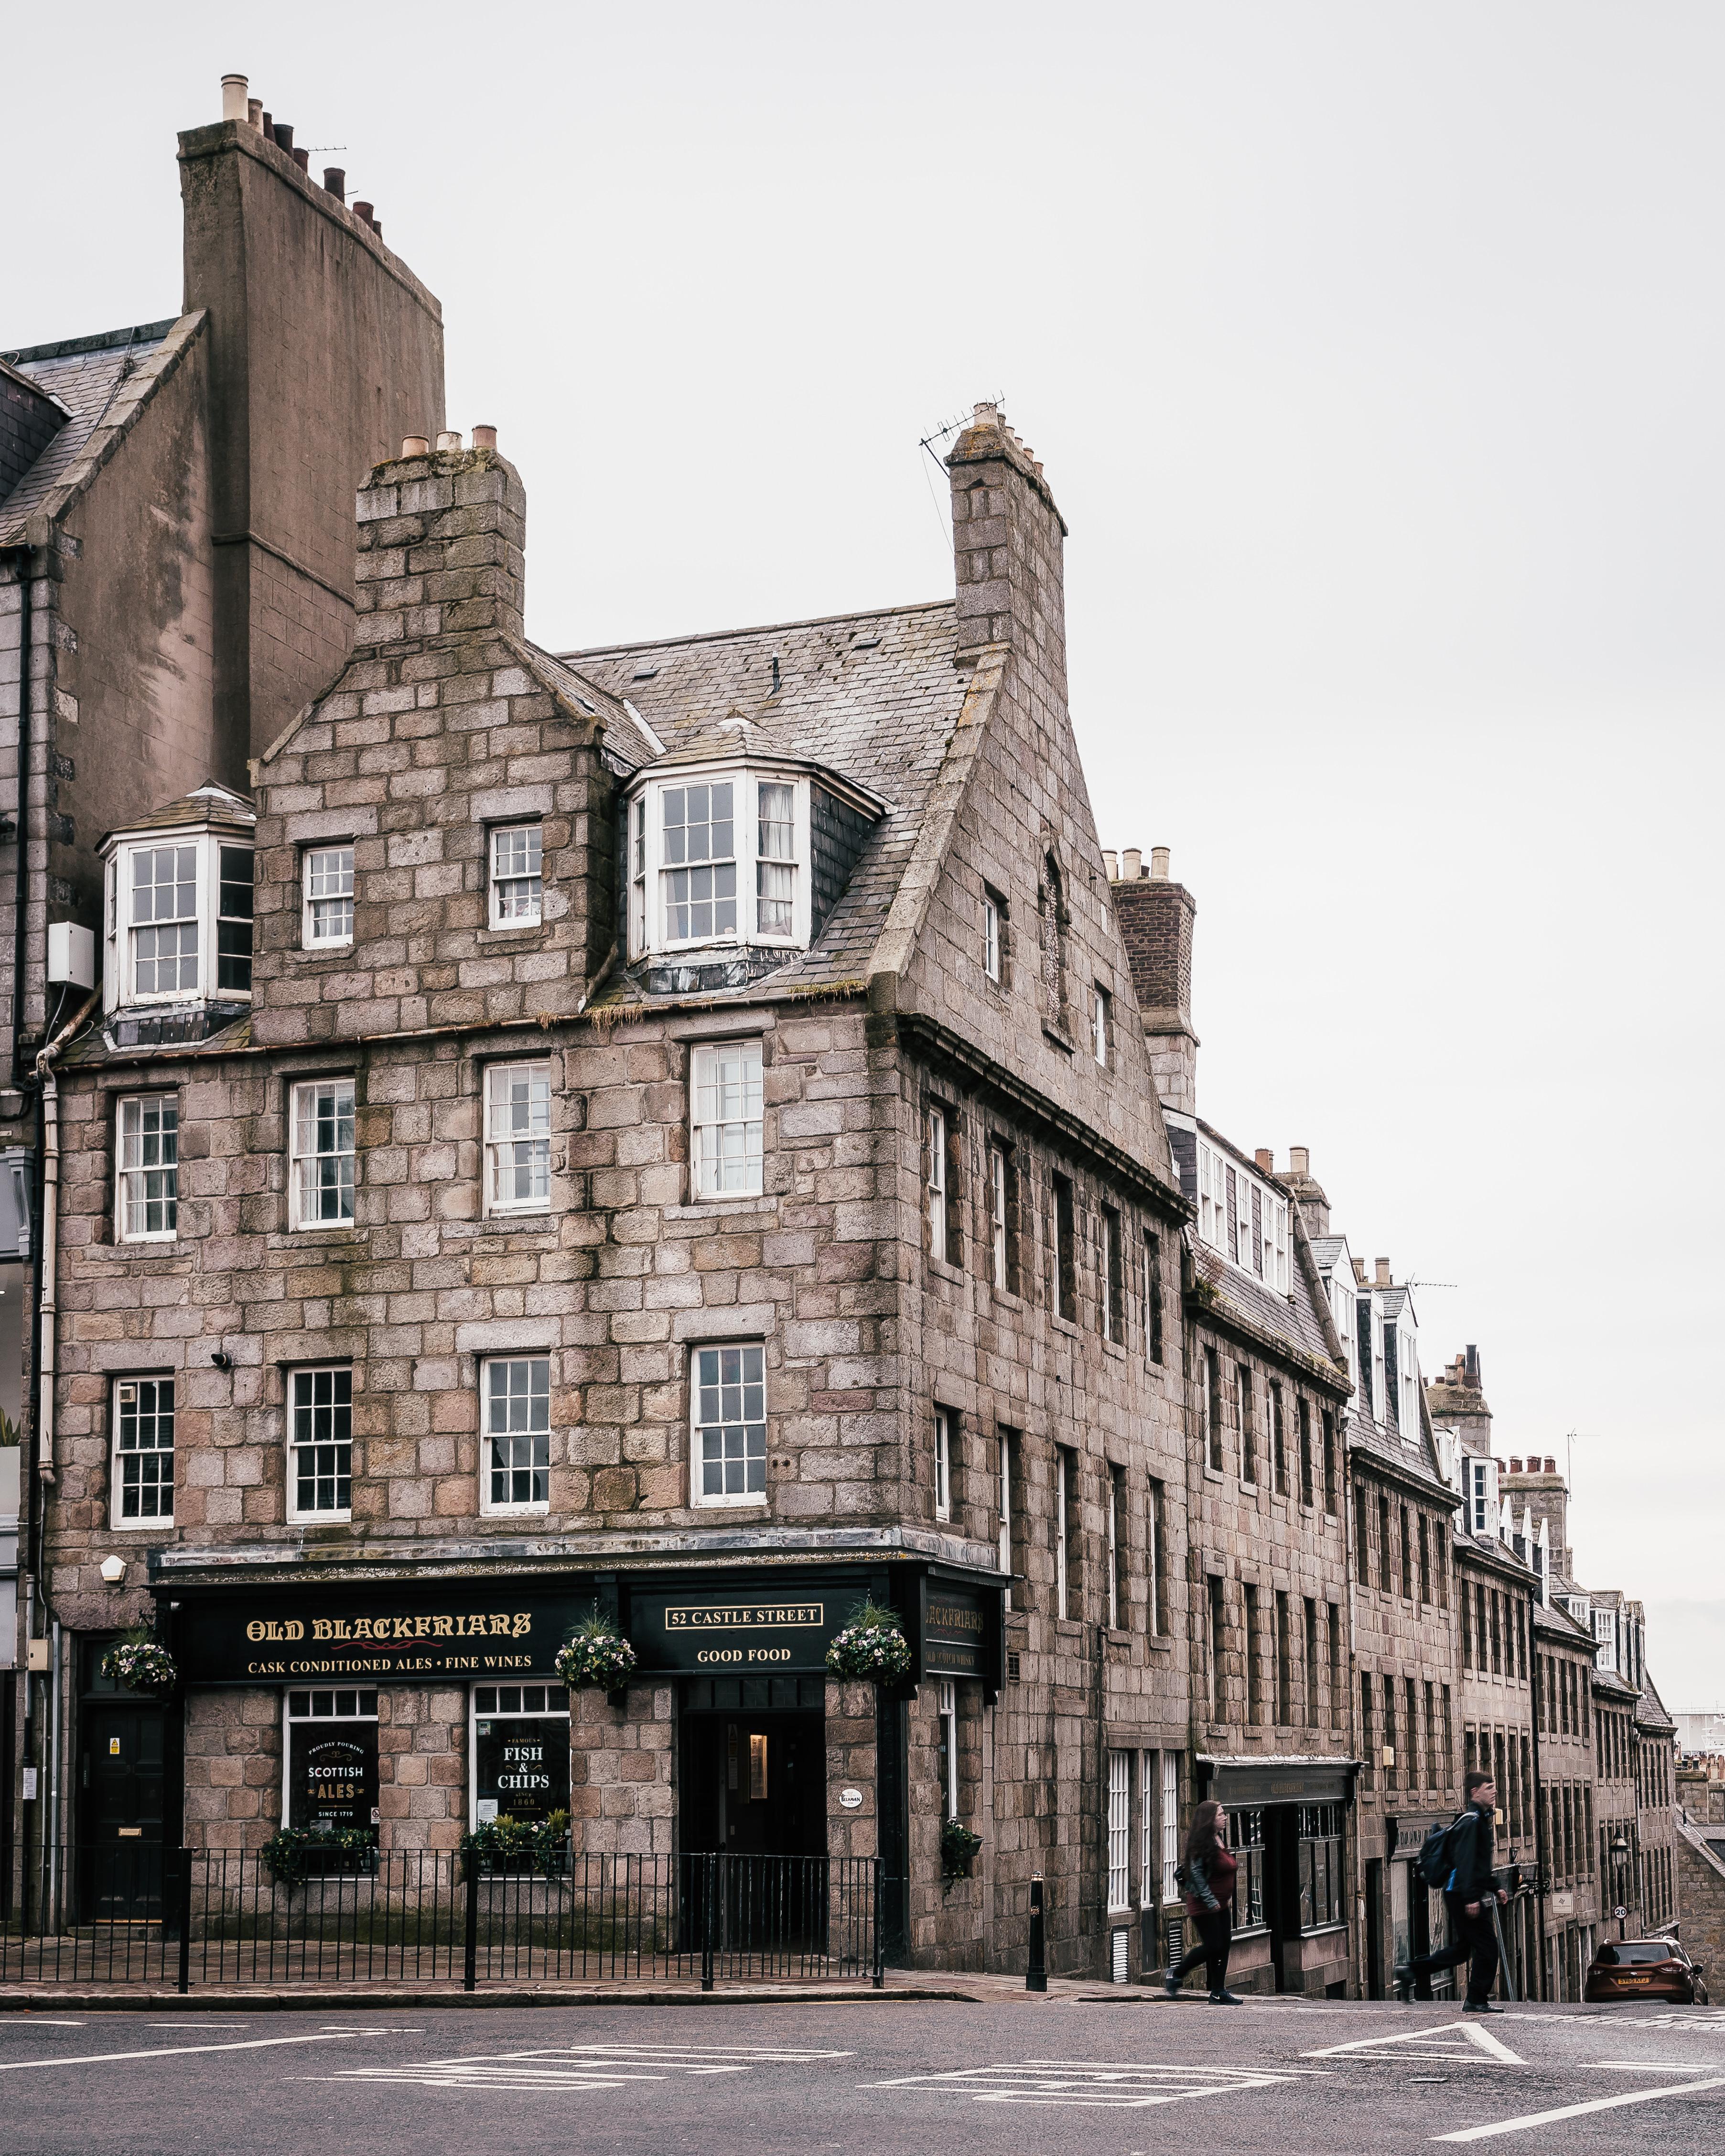 72 hours in Aberdeenshire | Marischal Street, Aberdeen